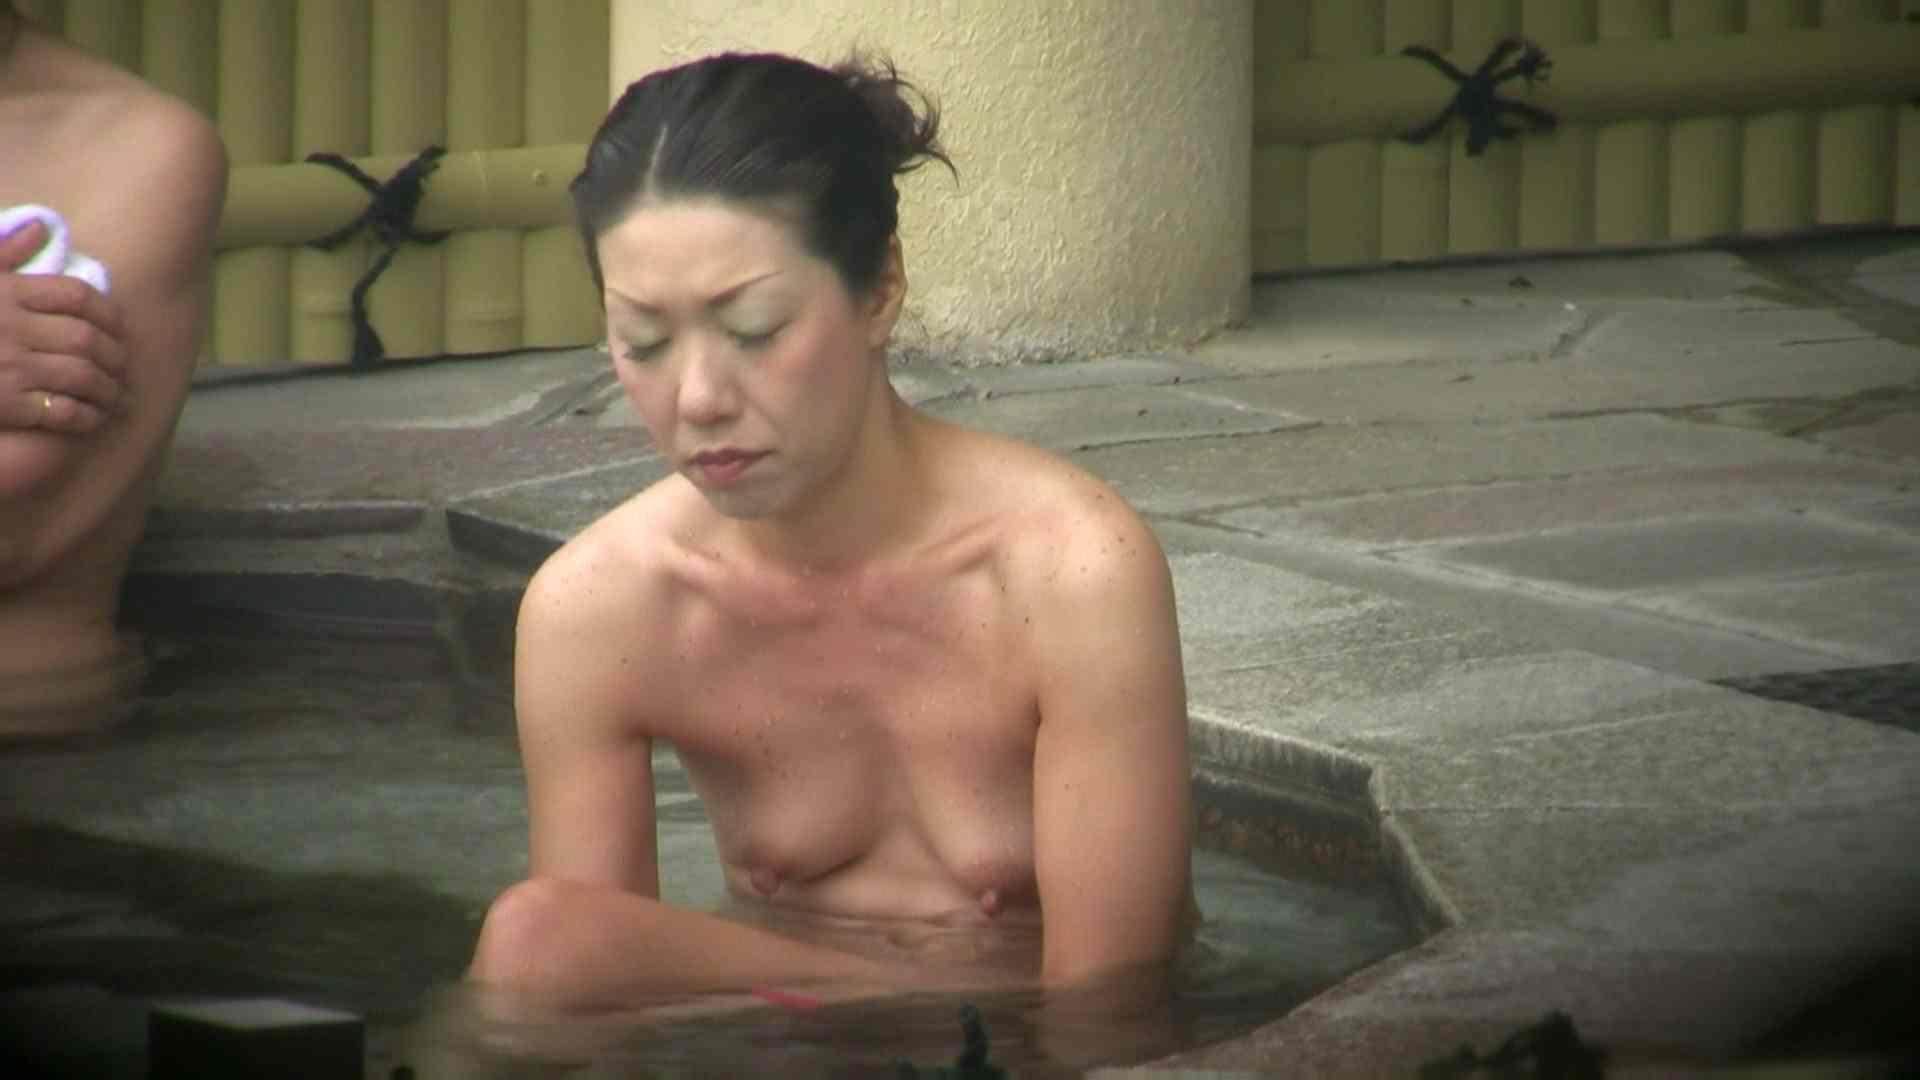 高画質露天女風呂観察 vol.036 望遠 ヌード画像 84pic 27